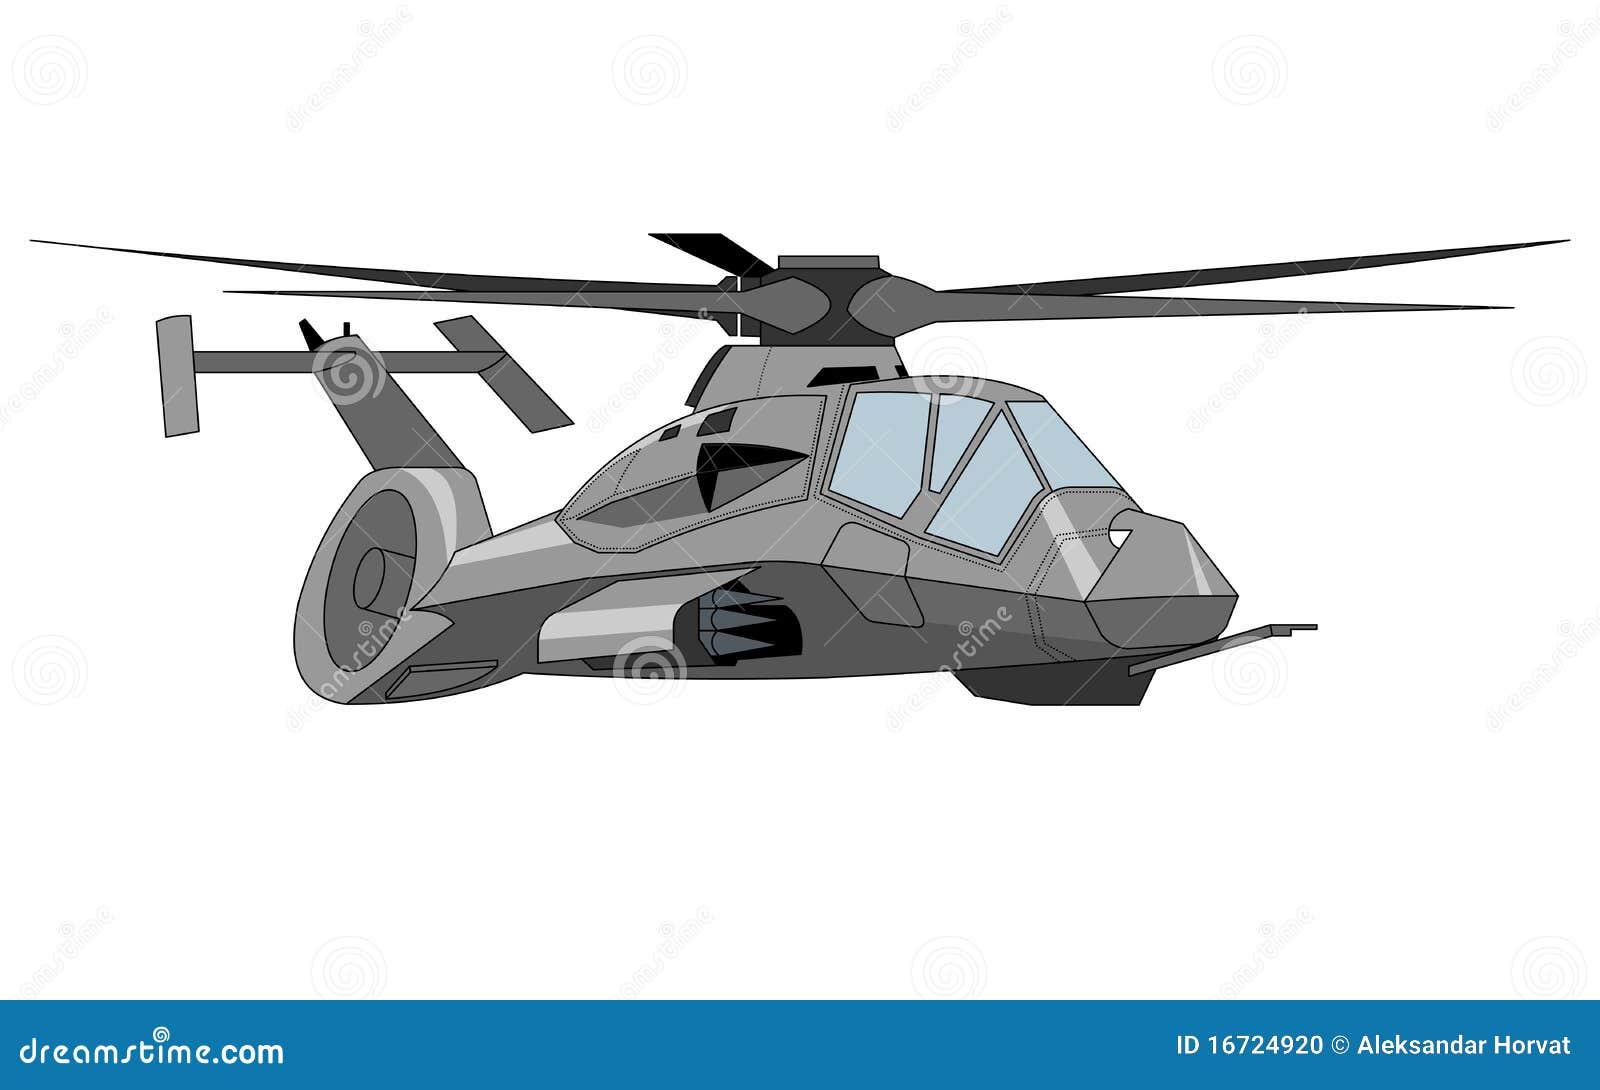 Military Helicopter Illustration Stock Photo - Image: 16724920